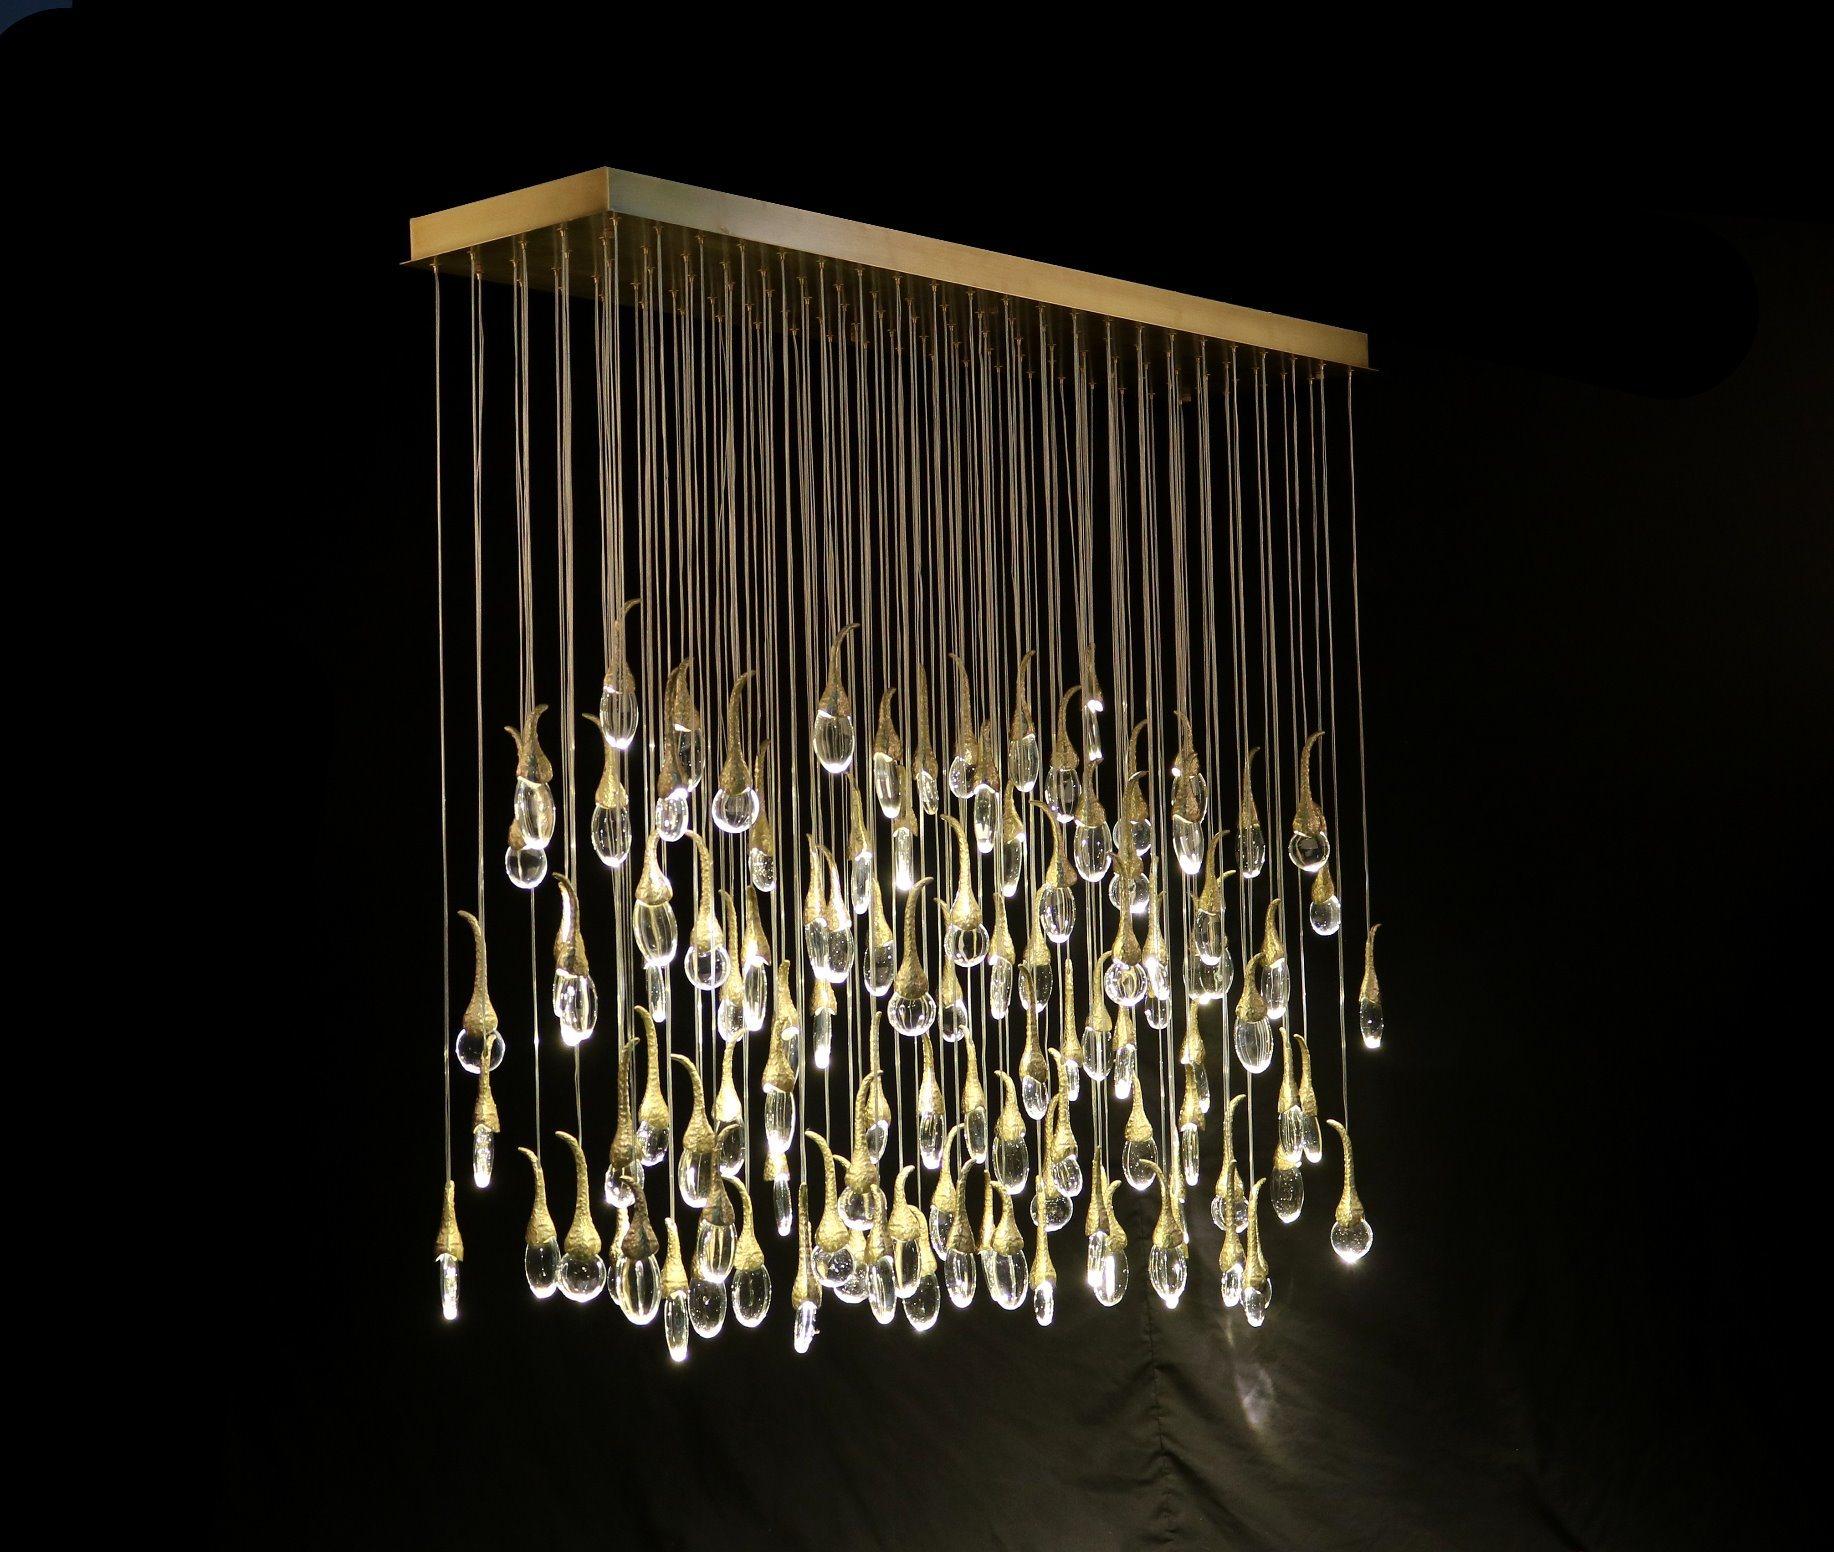 China Ochre Seed Pendant Lamp Lighting